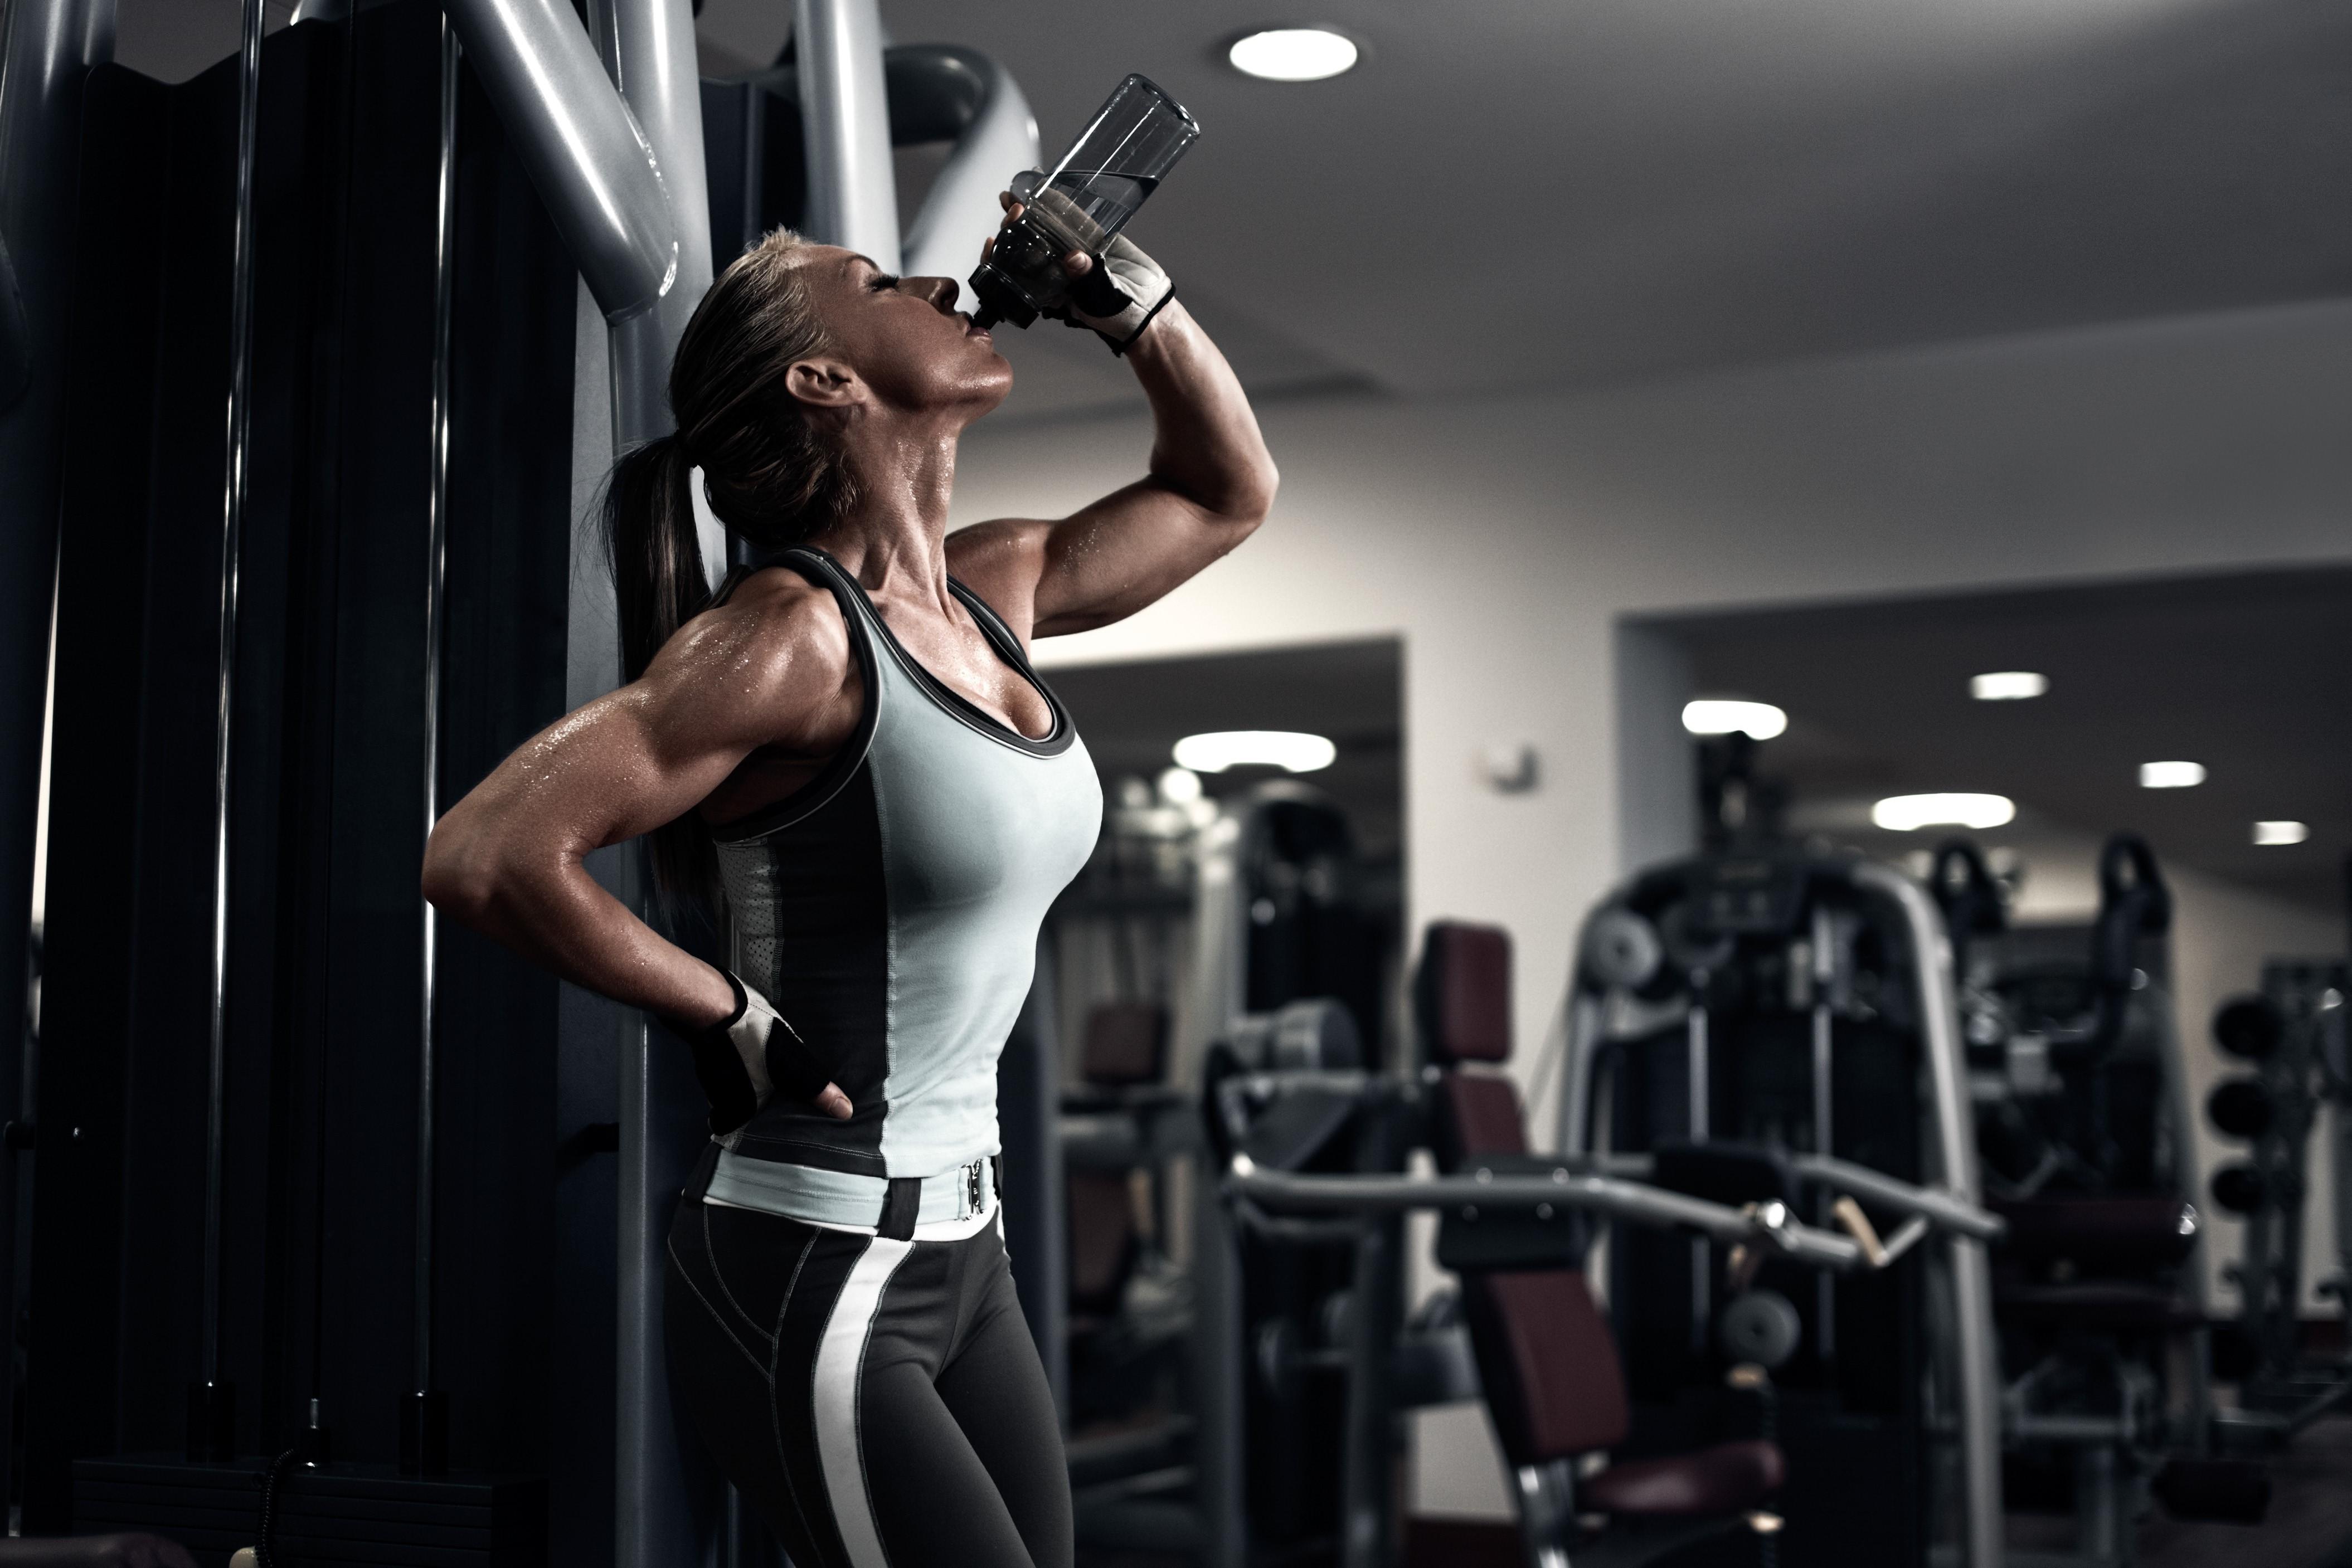 Семье, картинка фитнес мотивация